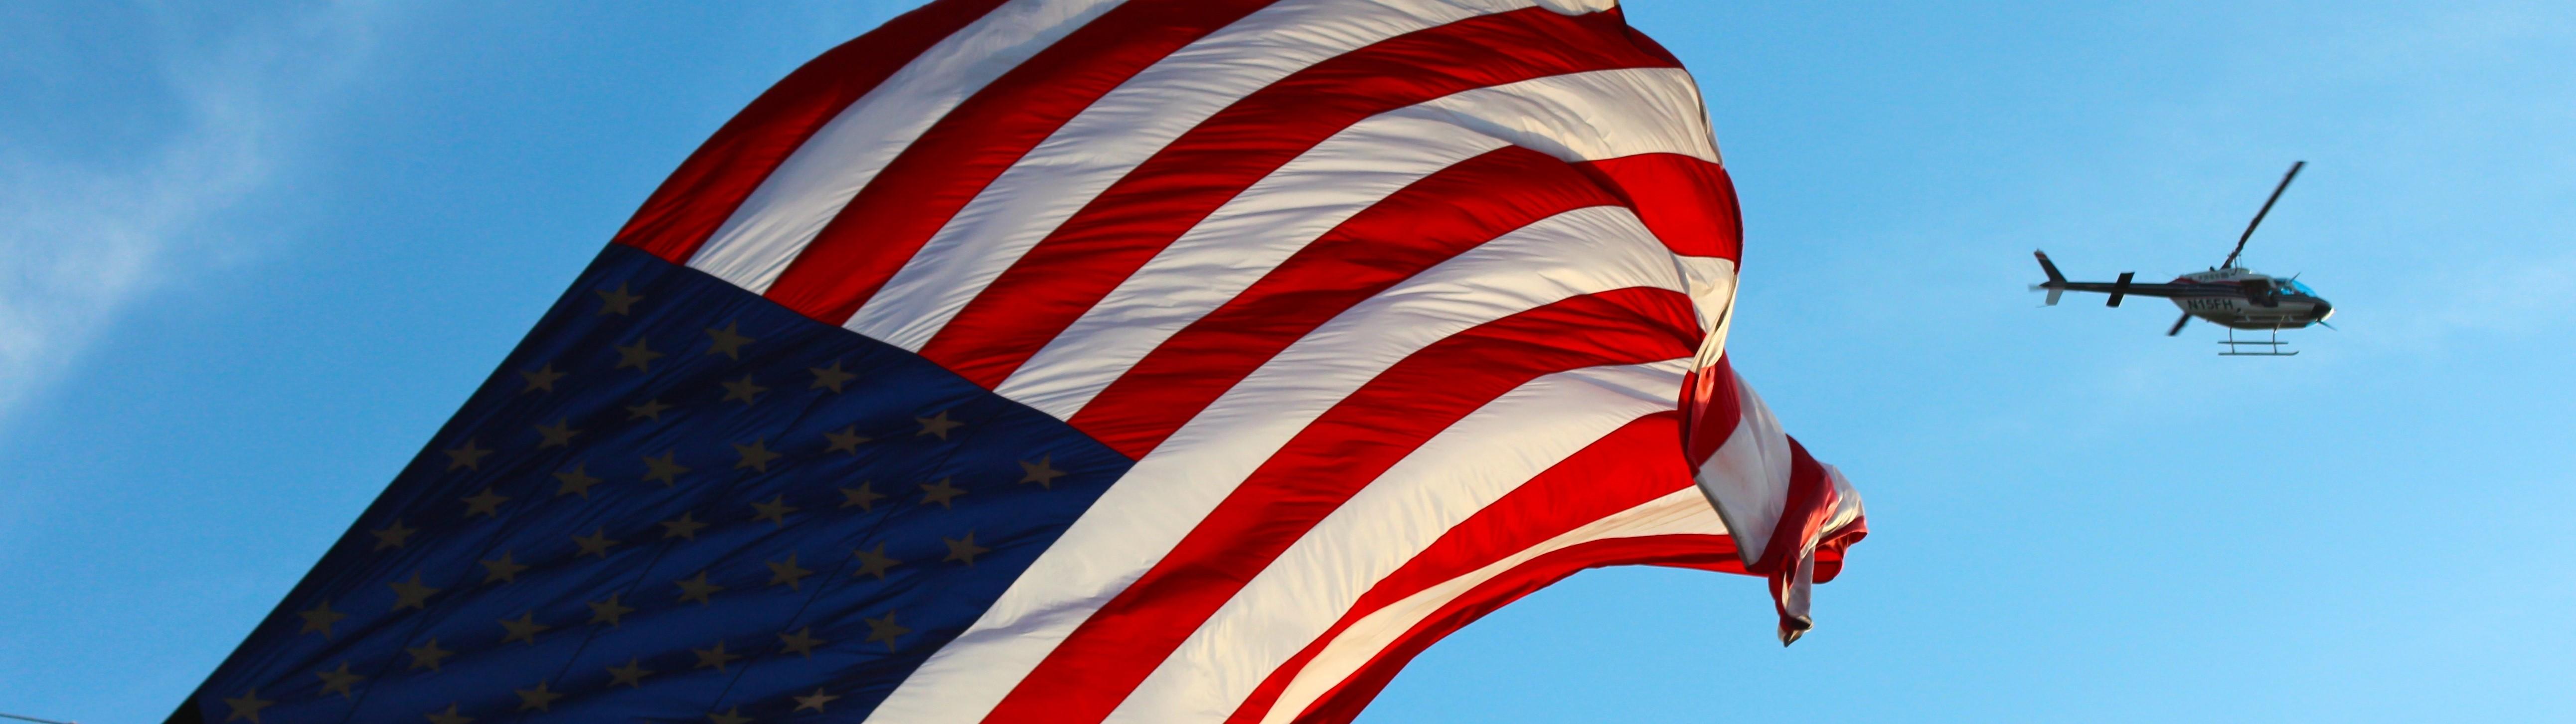 freedom-united-states-of-america-flag-america.jpeg